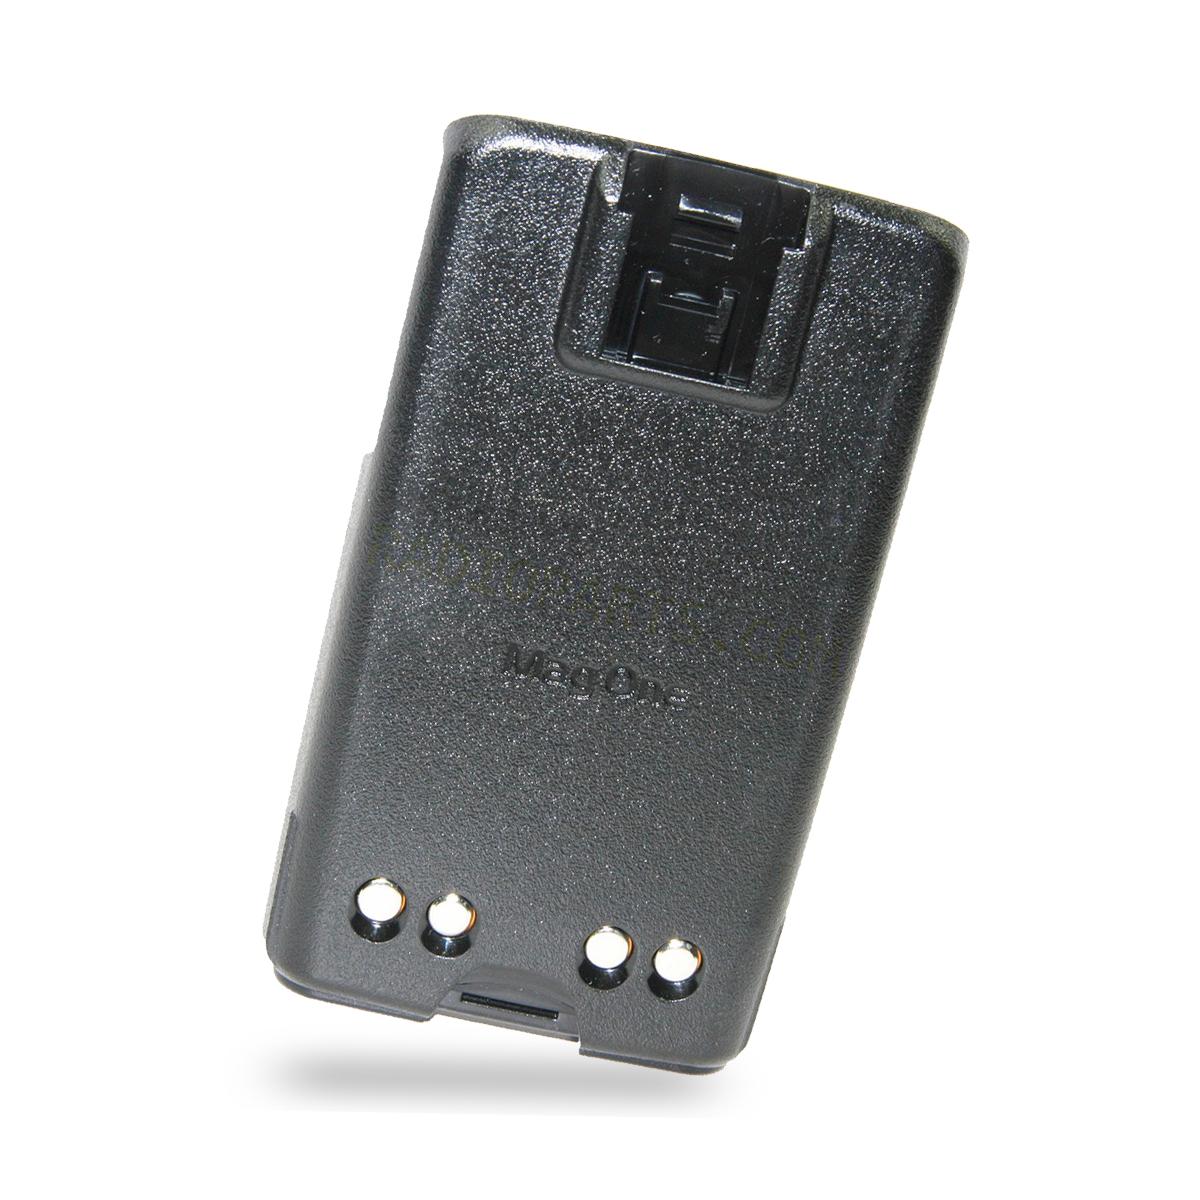 Batería Motorola Ni-MH 1200 mAh para radio Mag One A8 PMNN4071